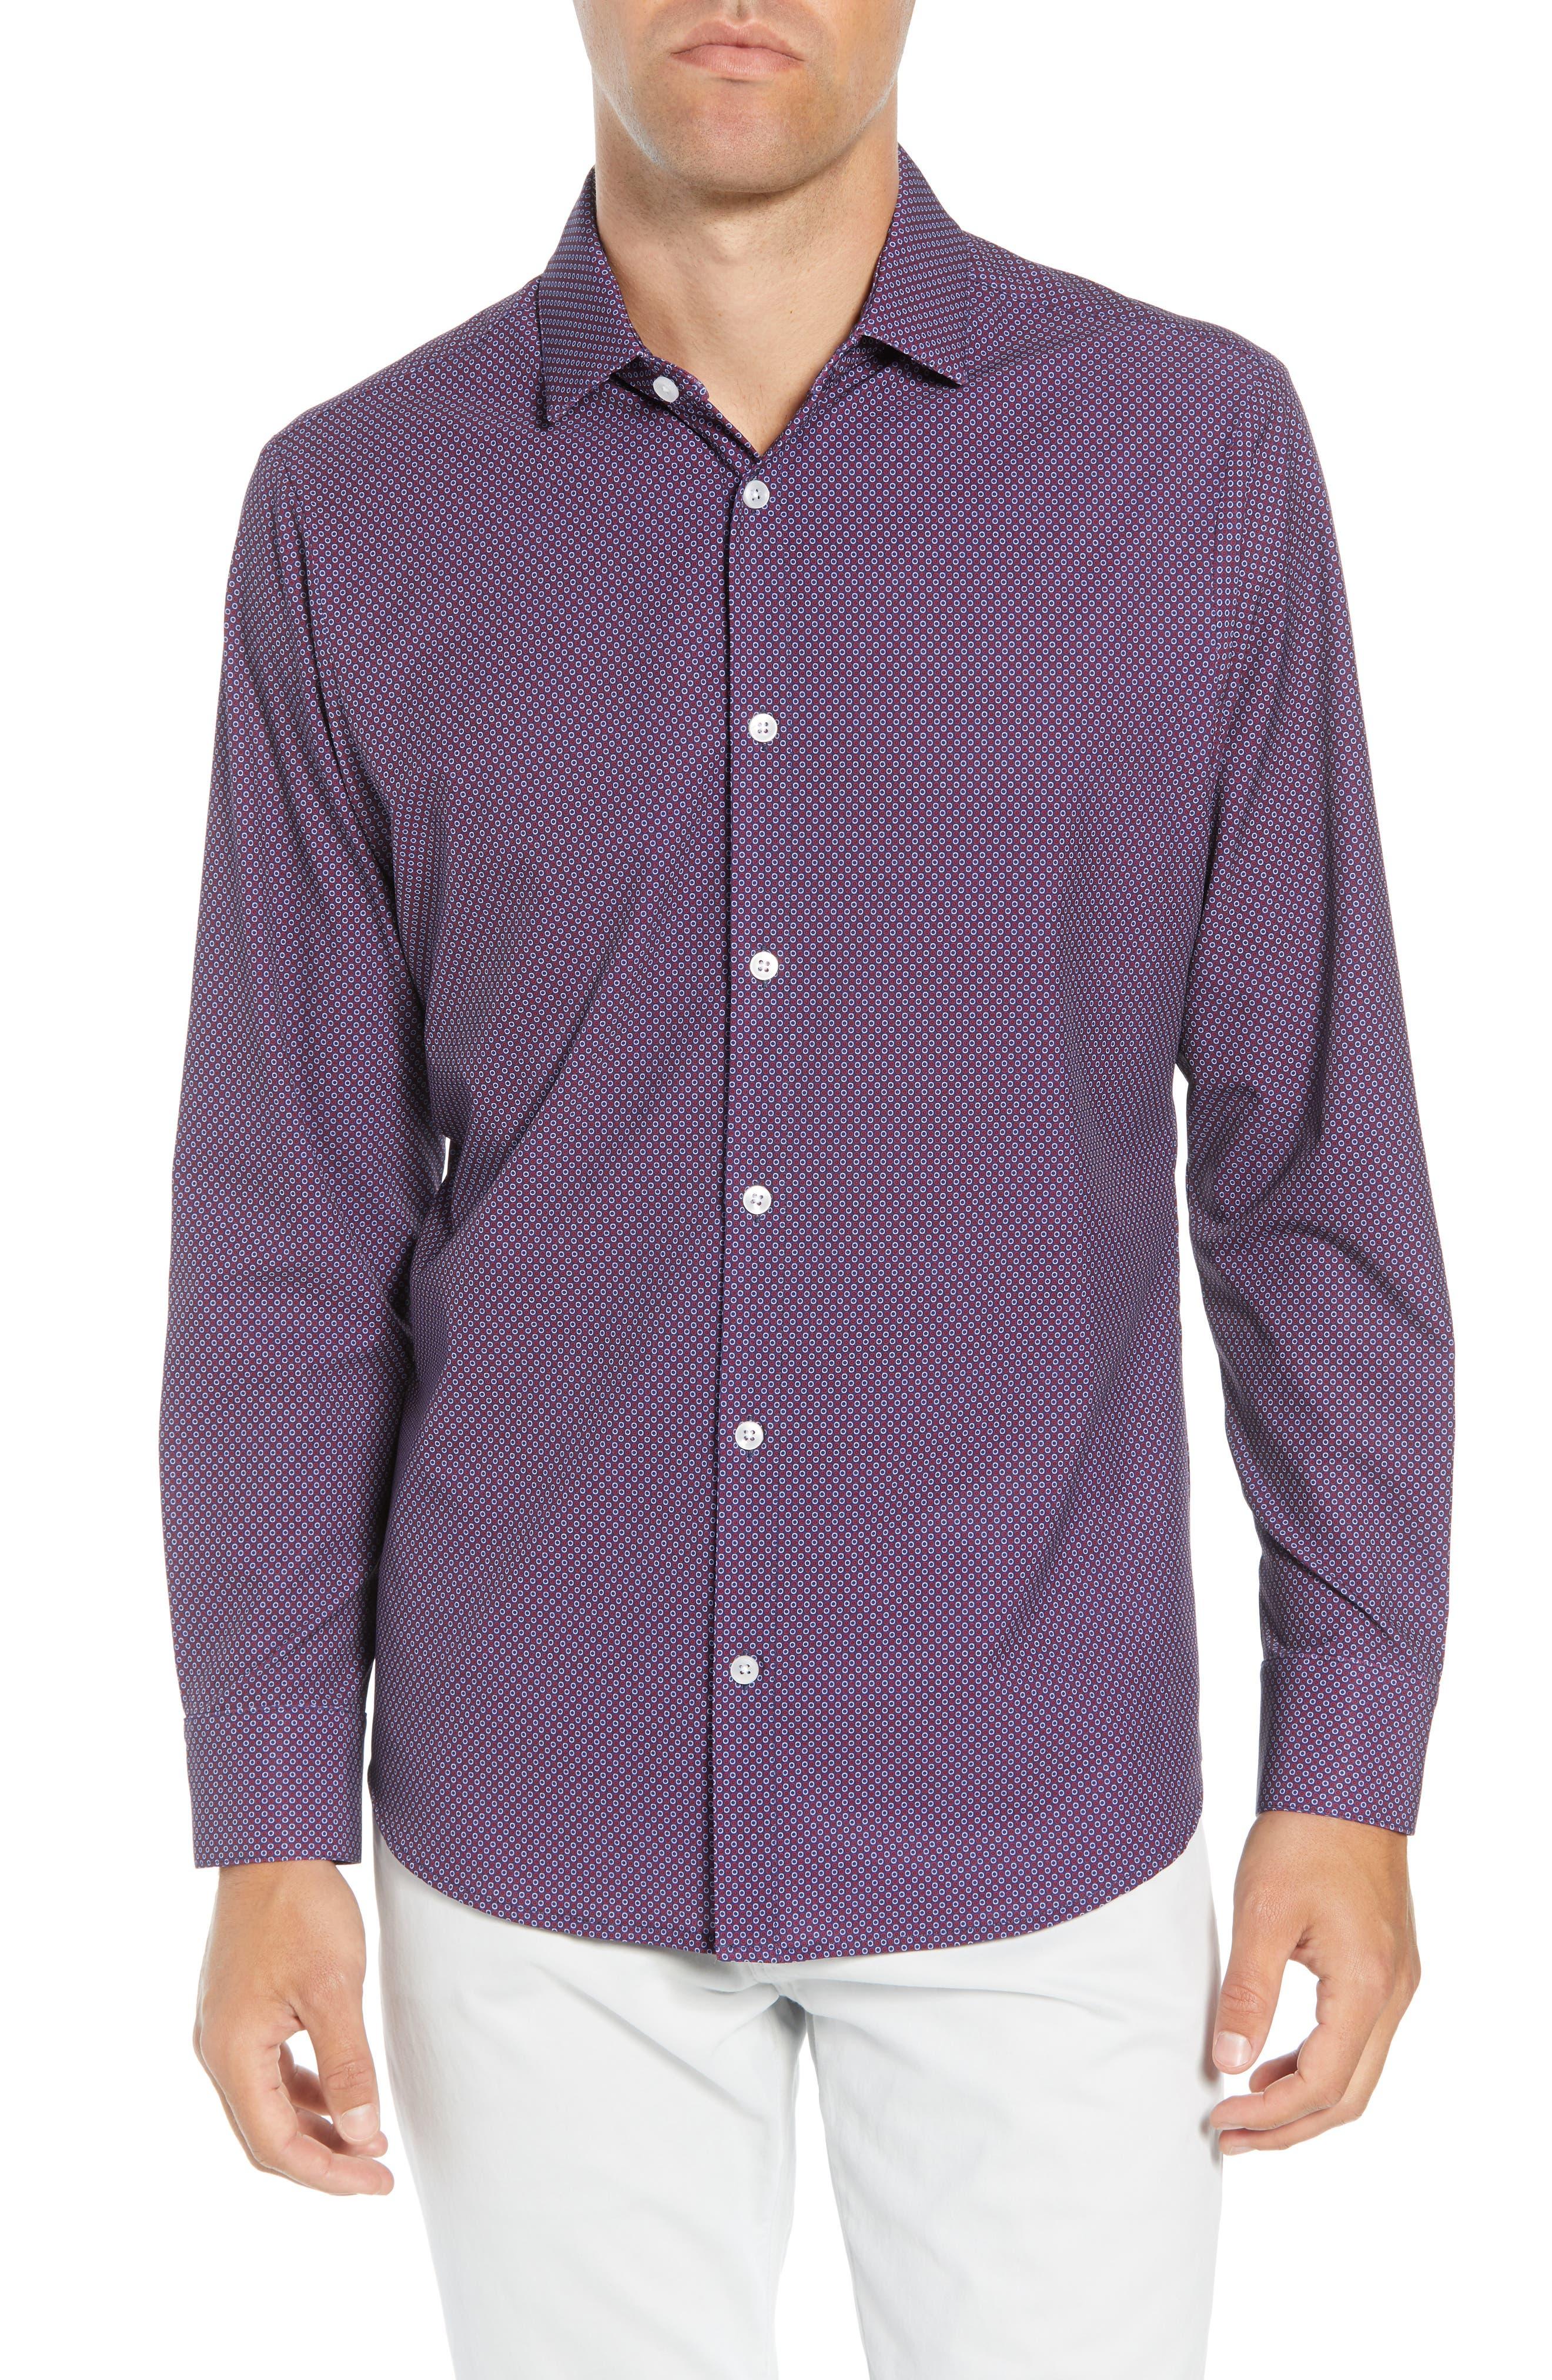 Damon Regular Fit Print Performance Sport Shirt,                             Main thumbnail 1, color,                             PLUM